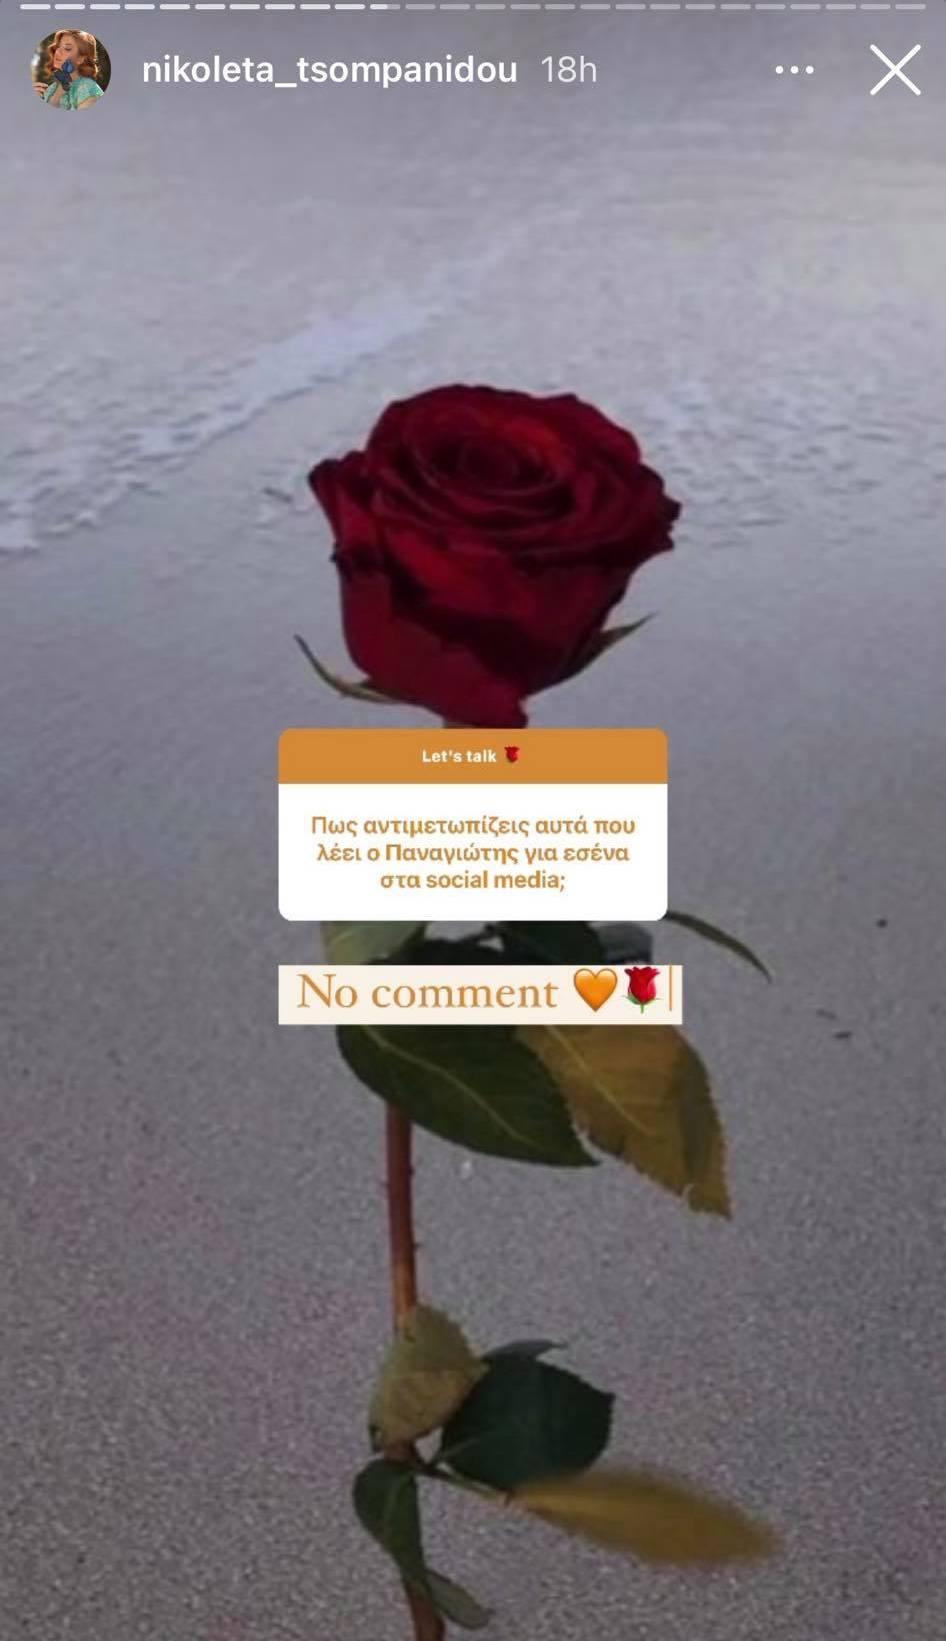 The Bachelor | Η απάντηση της Νικόλ Τσομπανίδου στην επίθεση του Παναγιώτη Βασιλάκου (Pic)